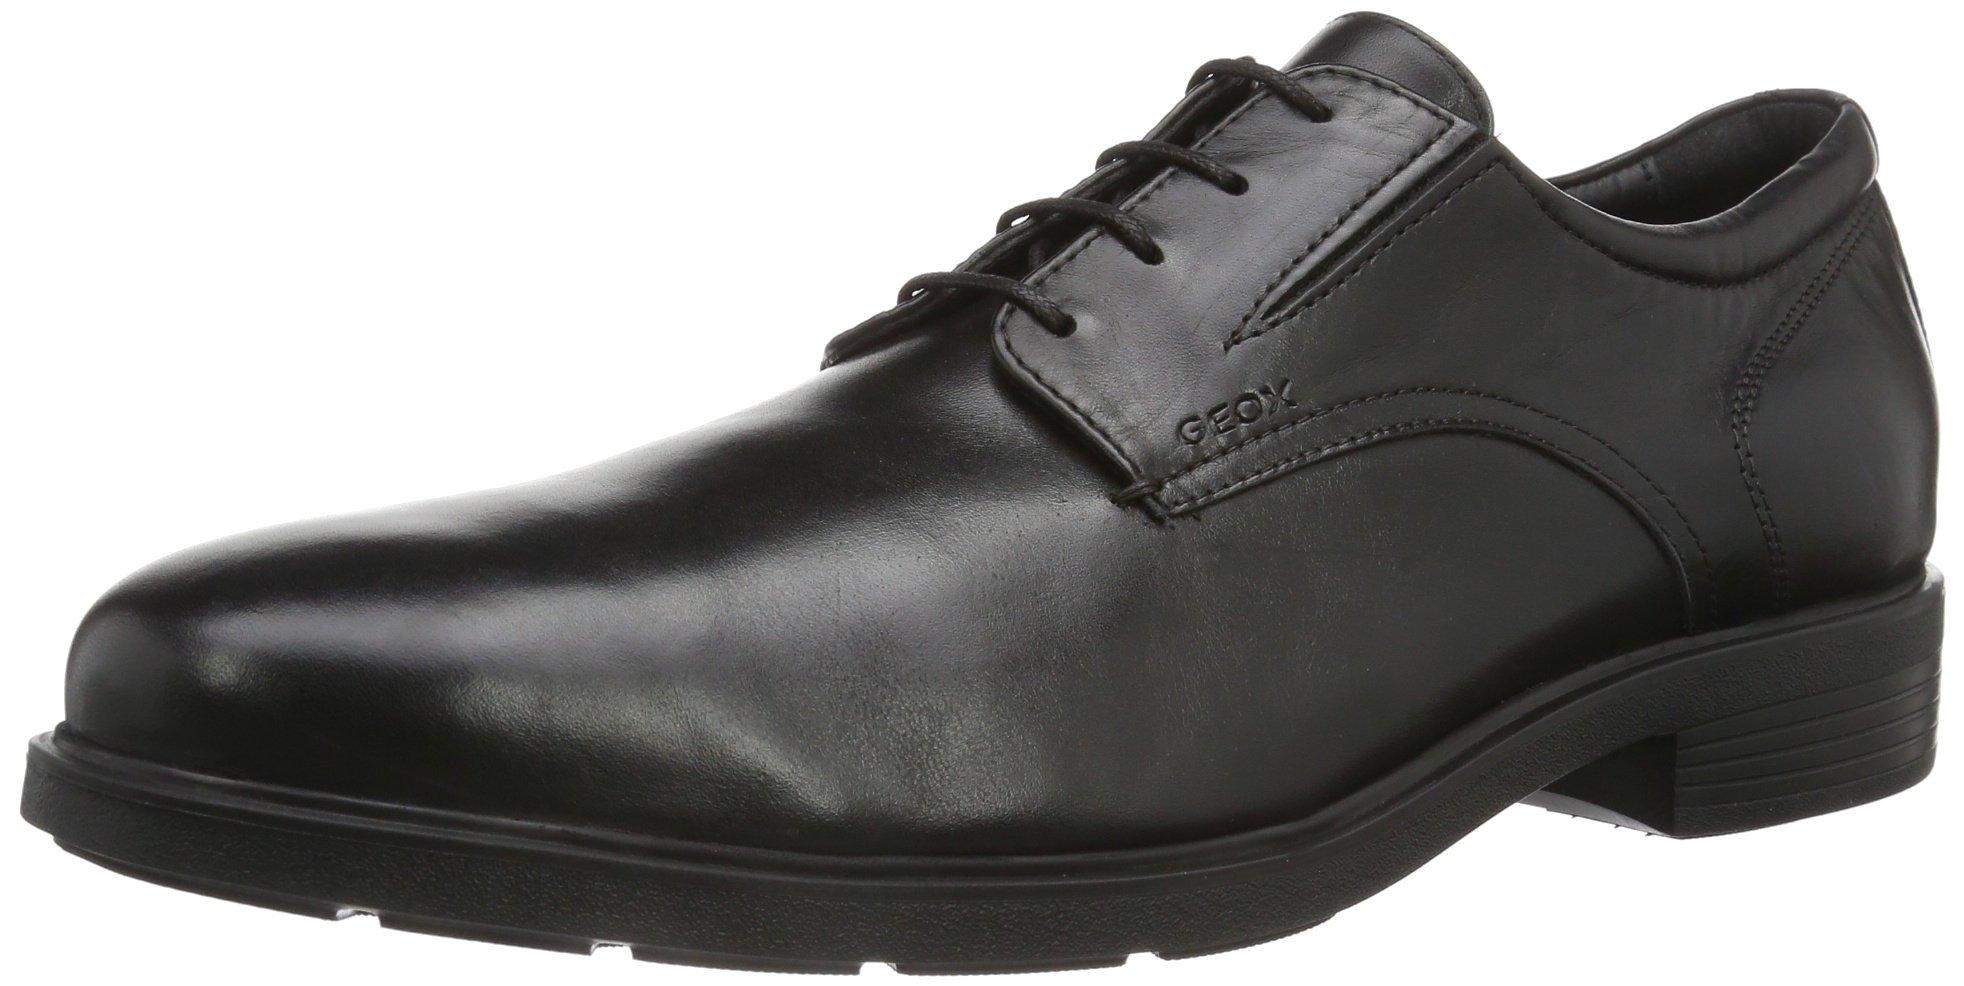 Geox Men's U Dublin 3 Plain Toe Oxford,Black,43 EU/10 M US